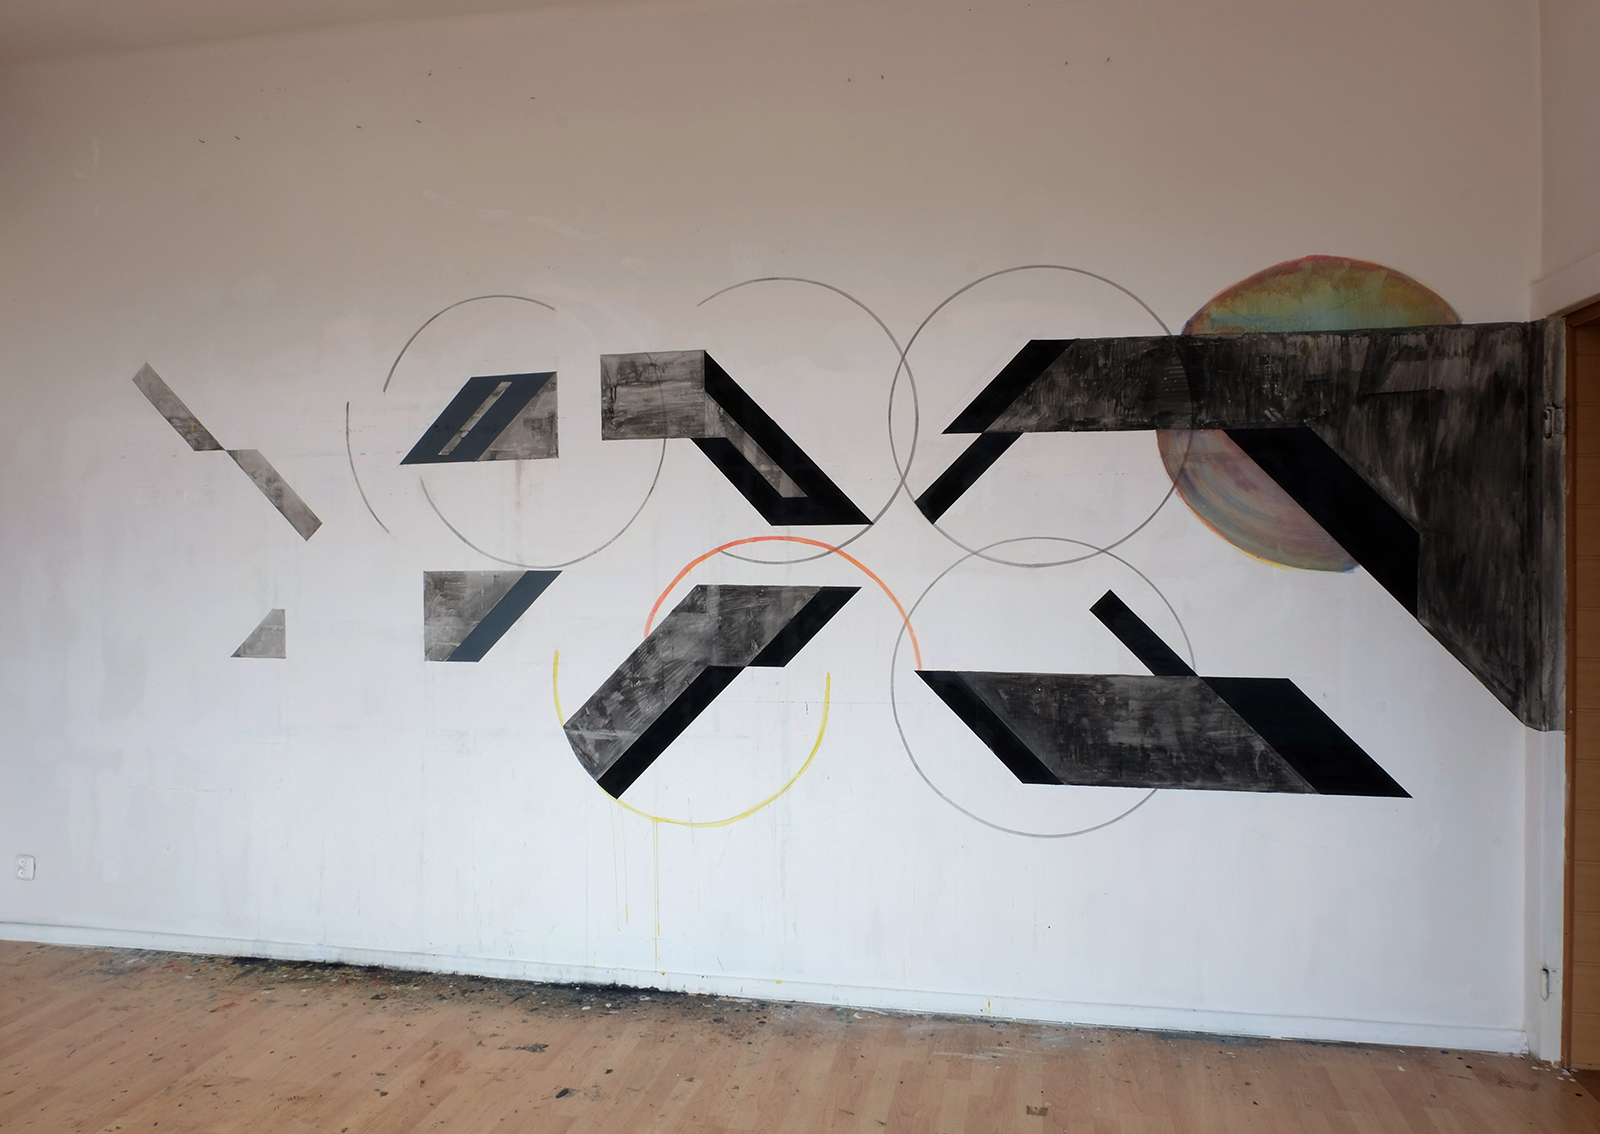 rusin-blazej-serhii-torbinov-peace-project-07